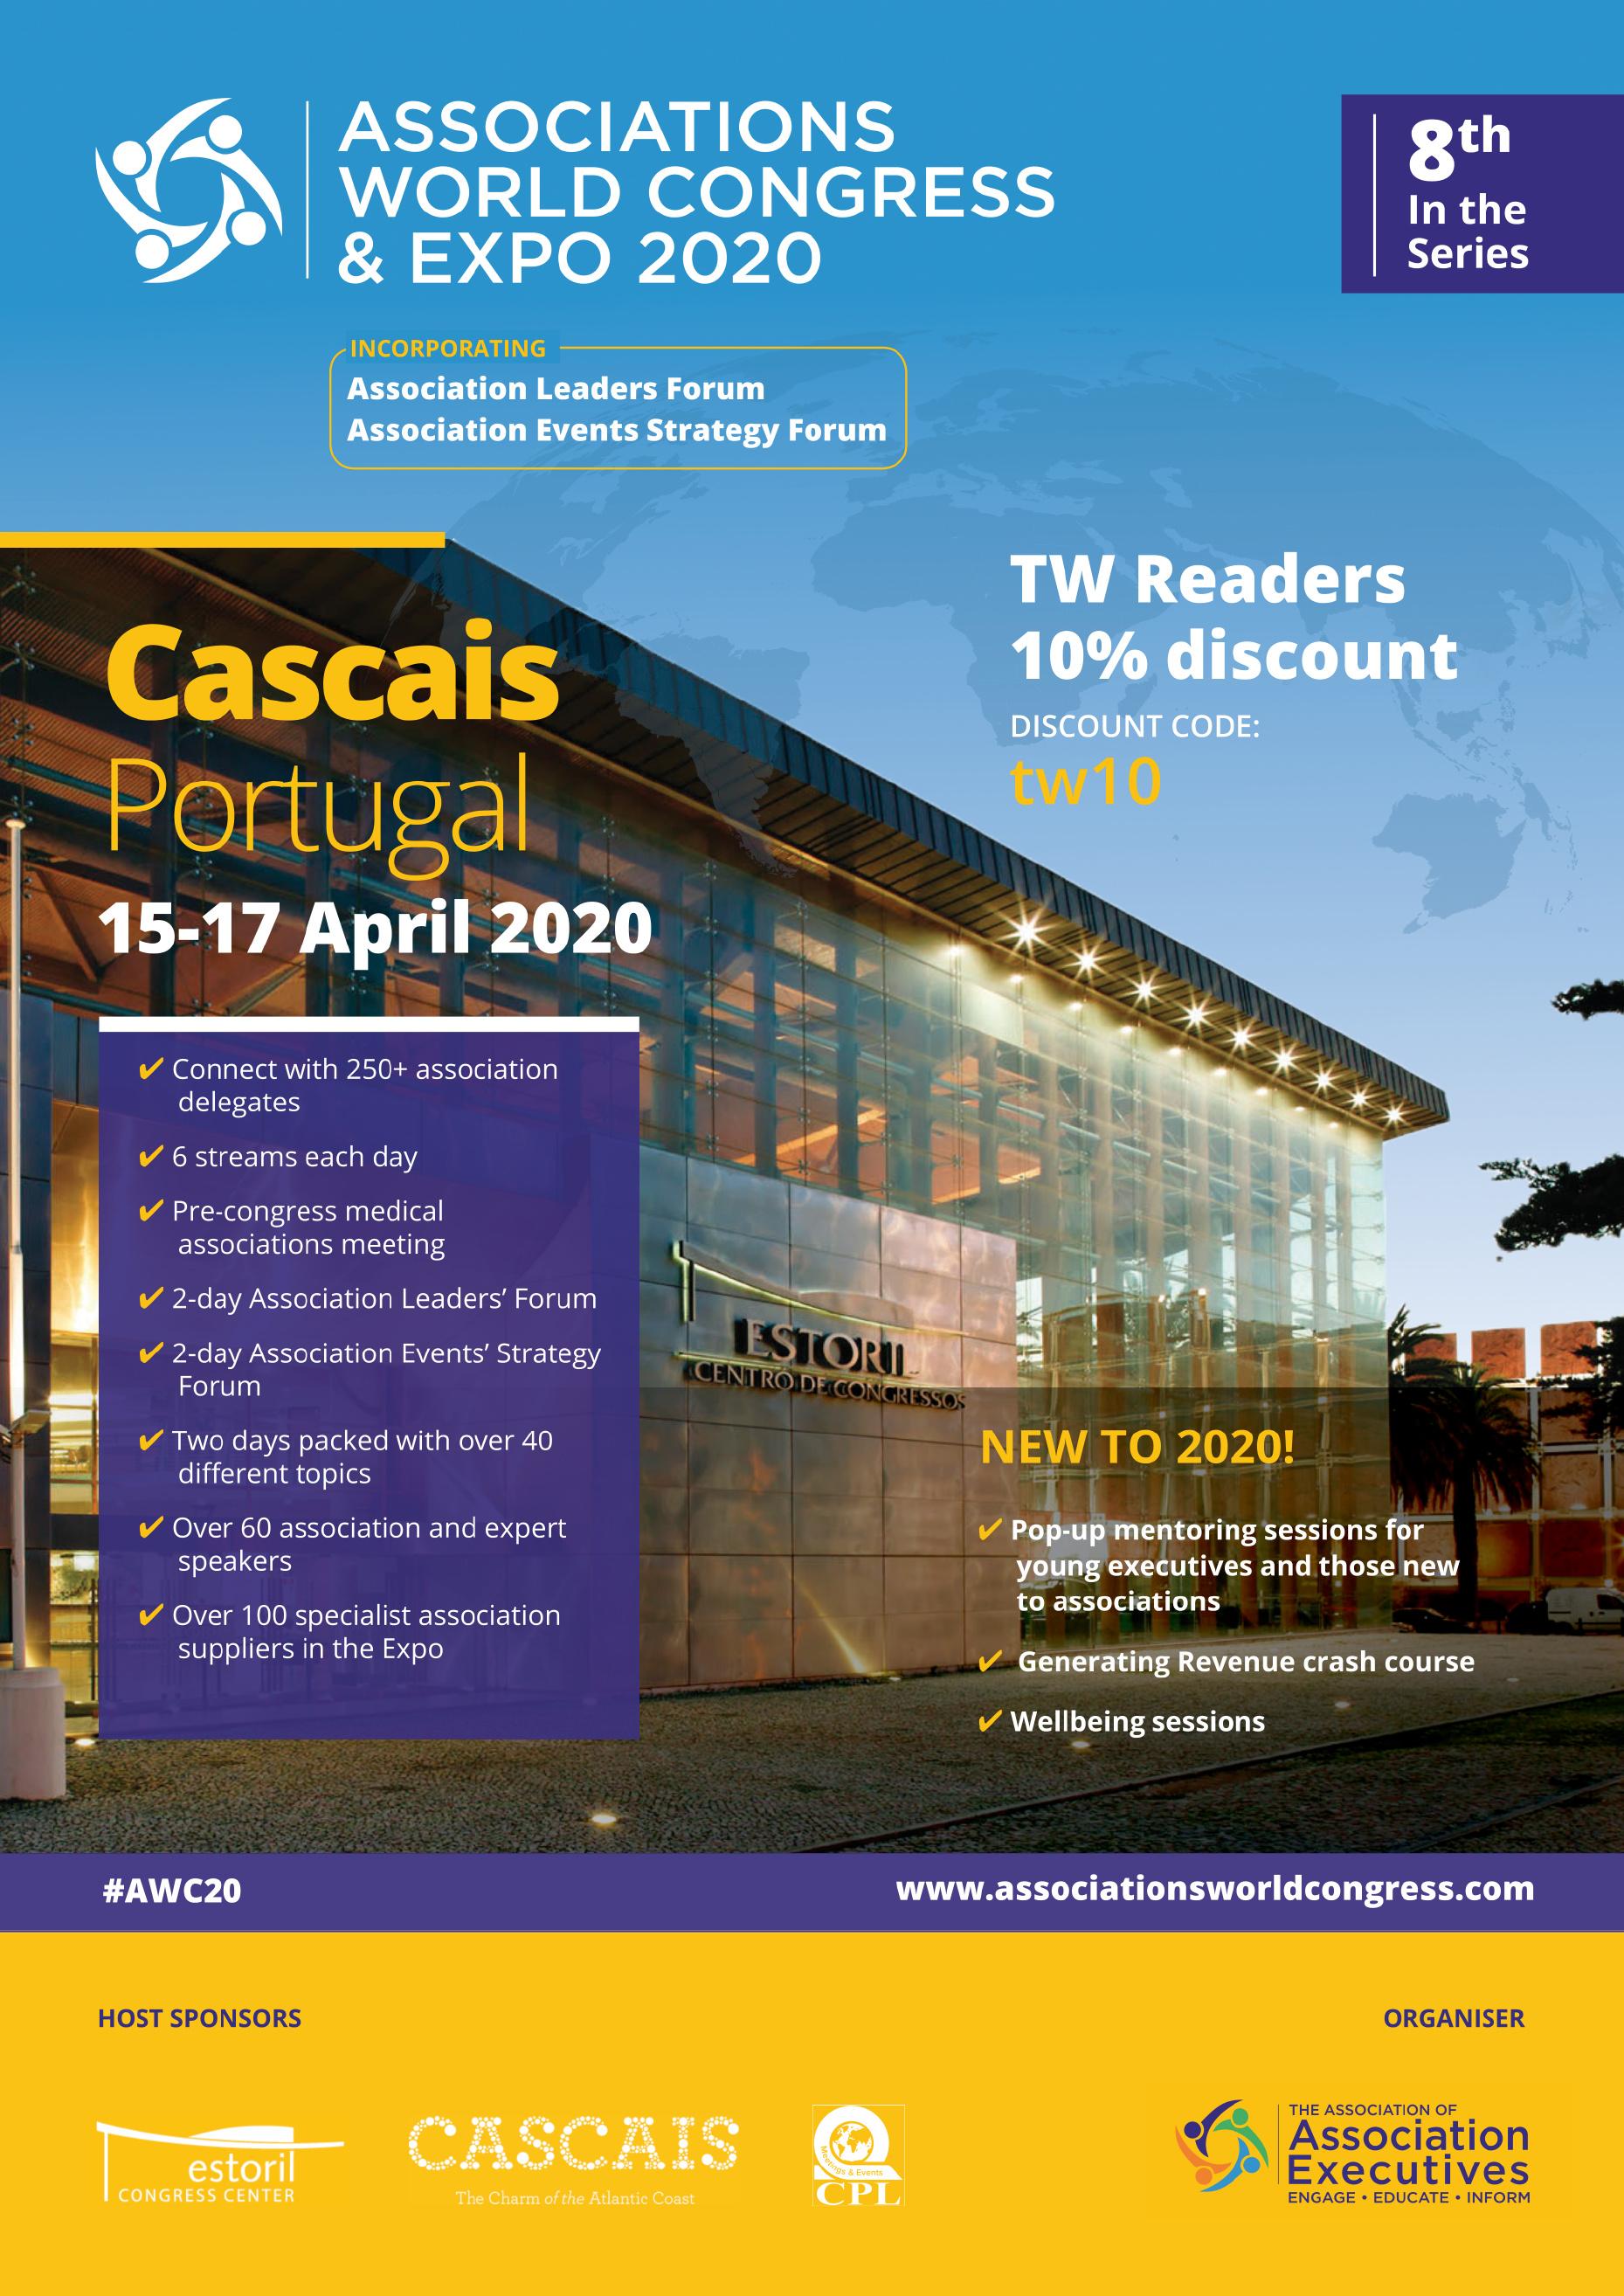 Associations World Congress & Expo